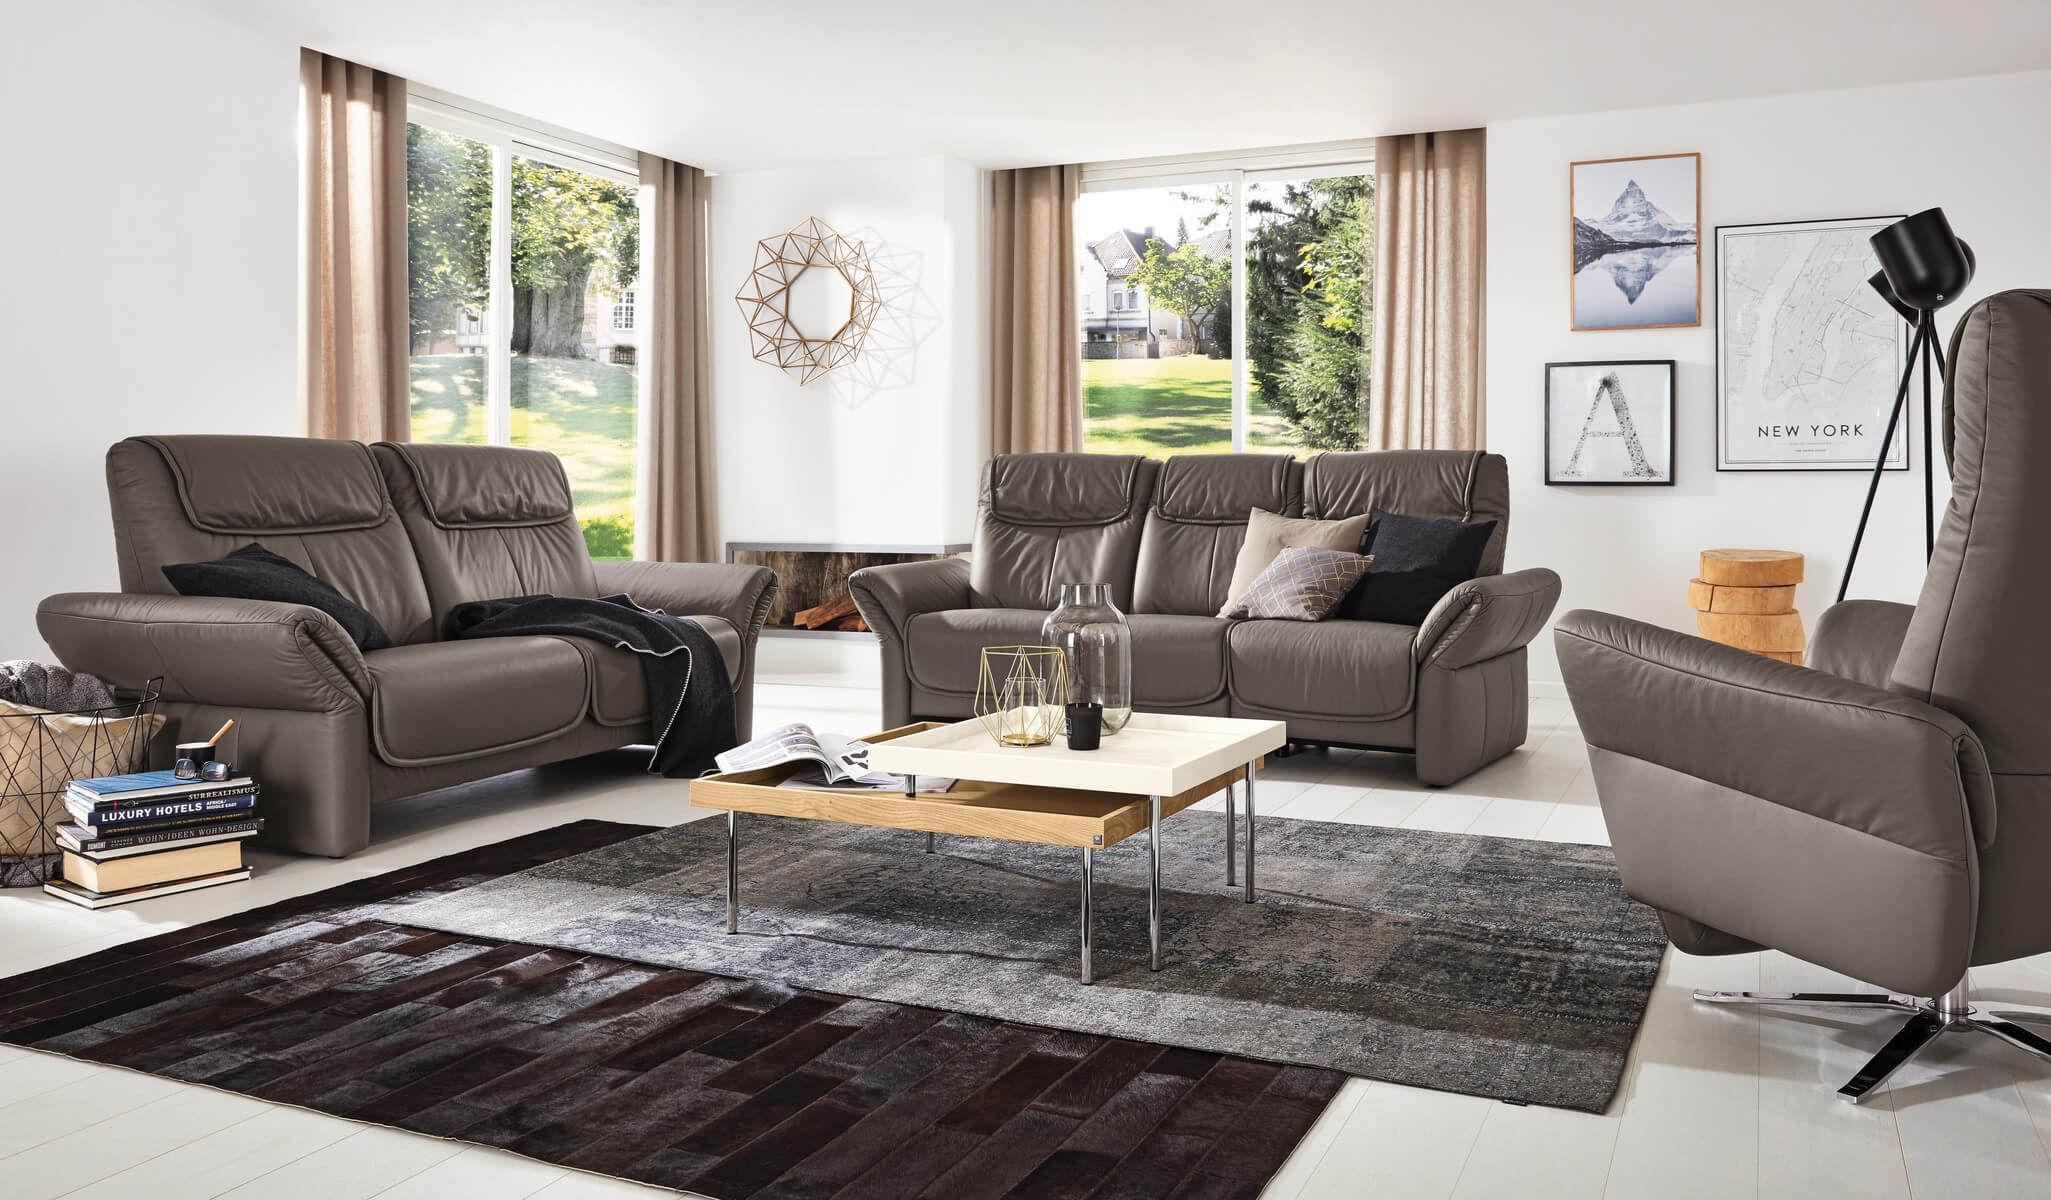 Modernes Sofa Leder Hochlehner Mr 380 Musterring